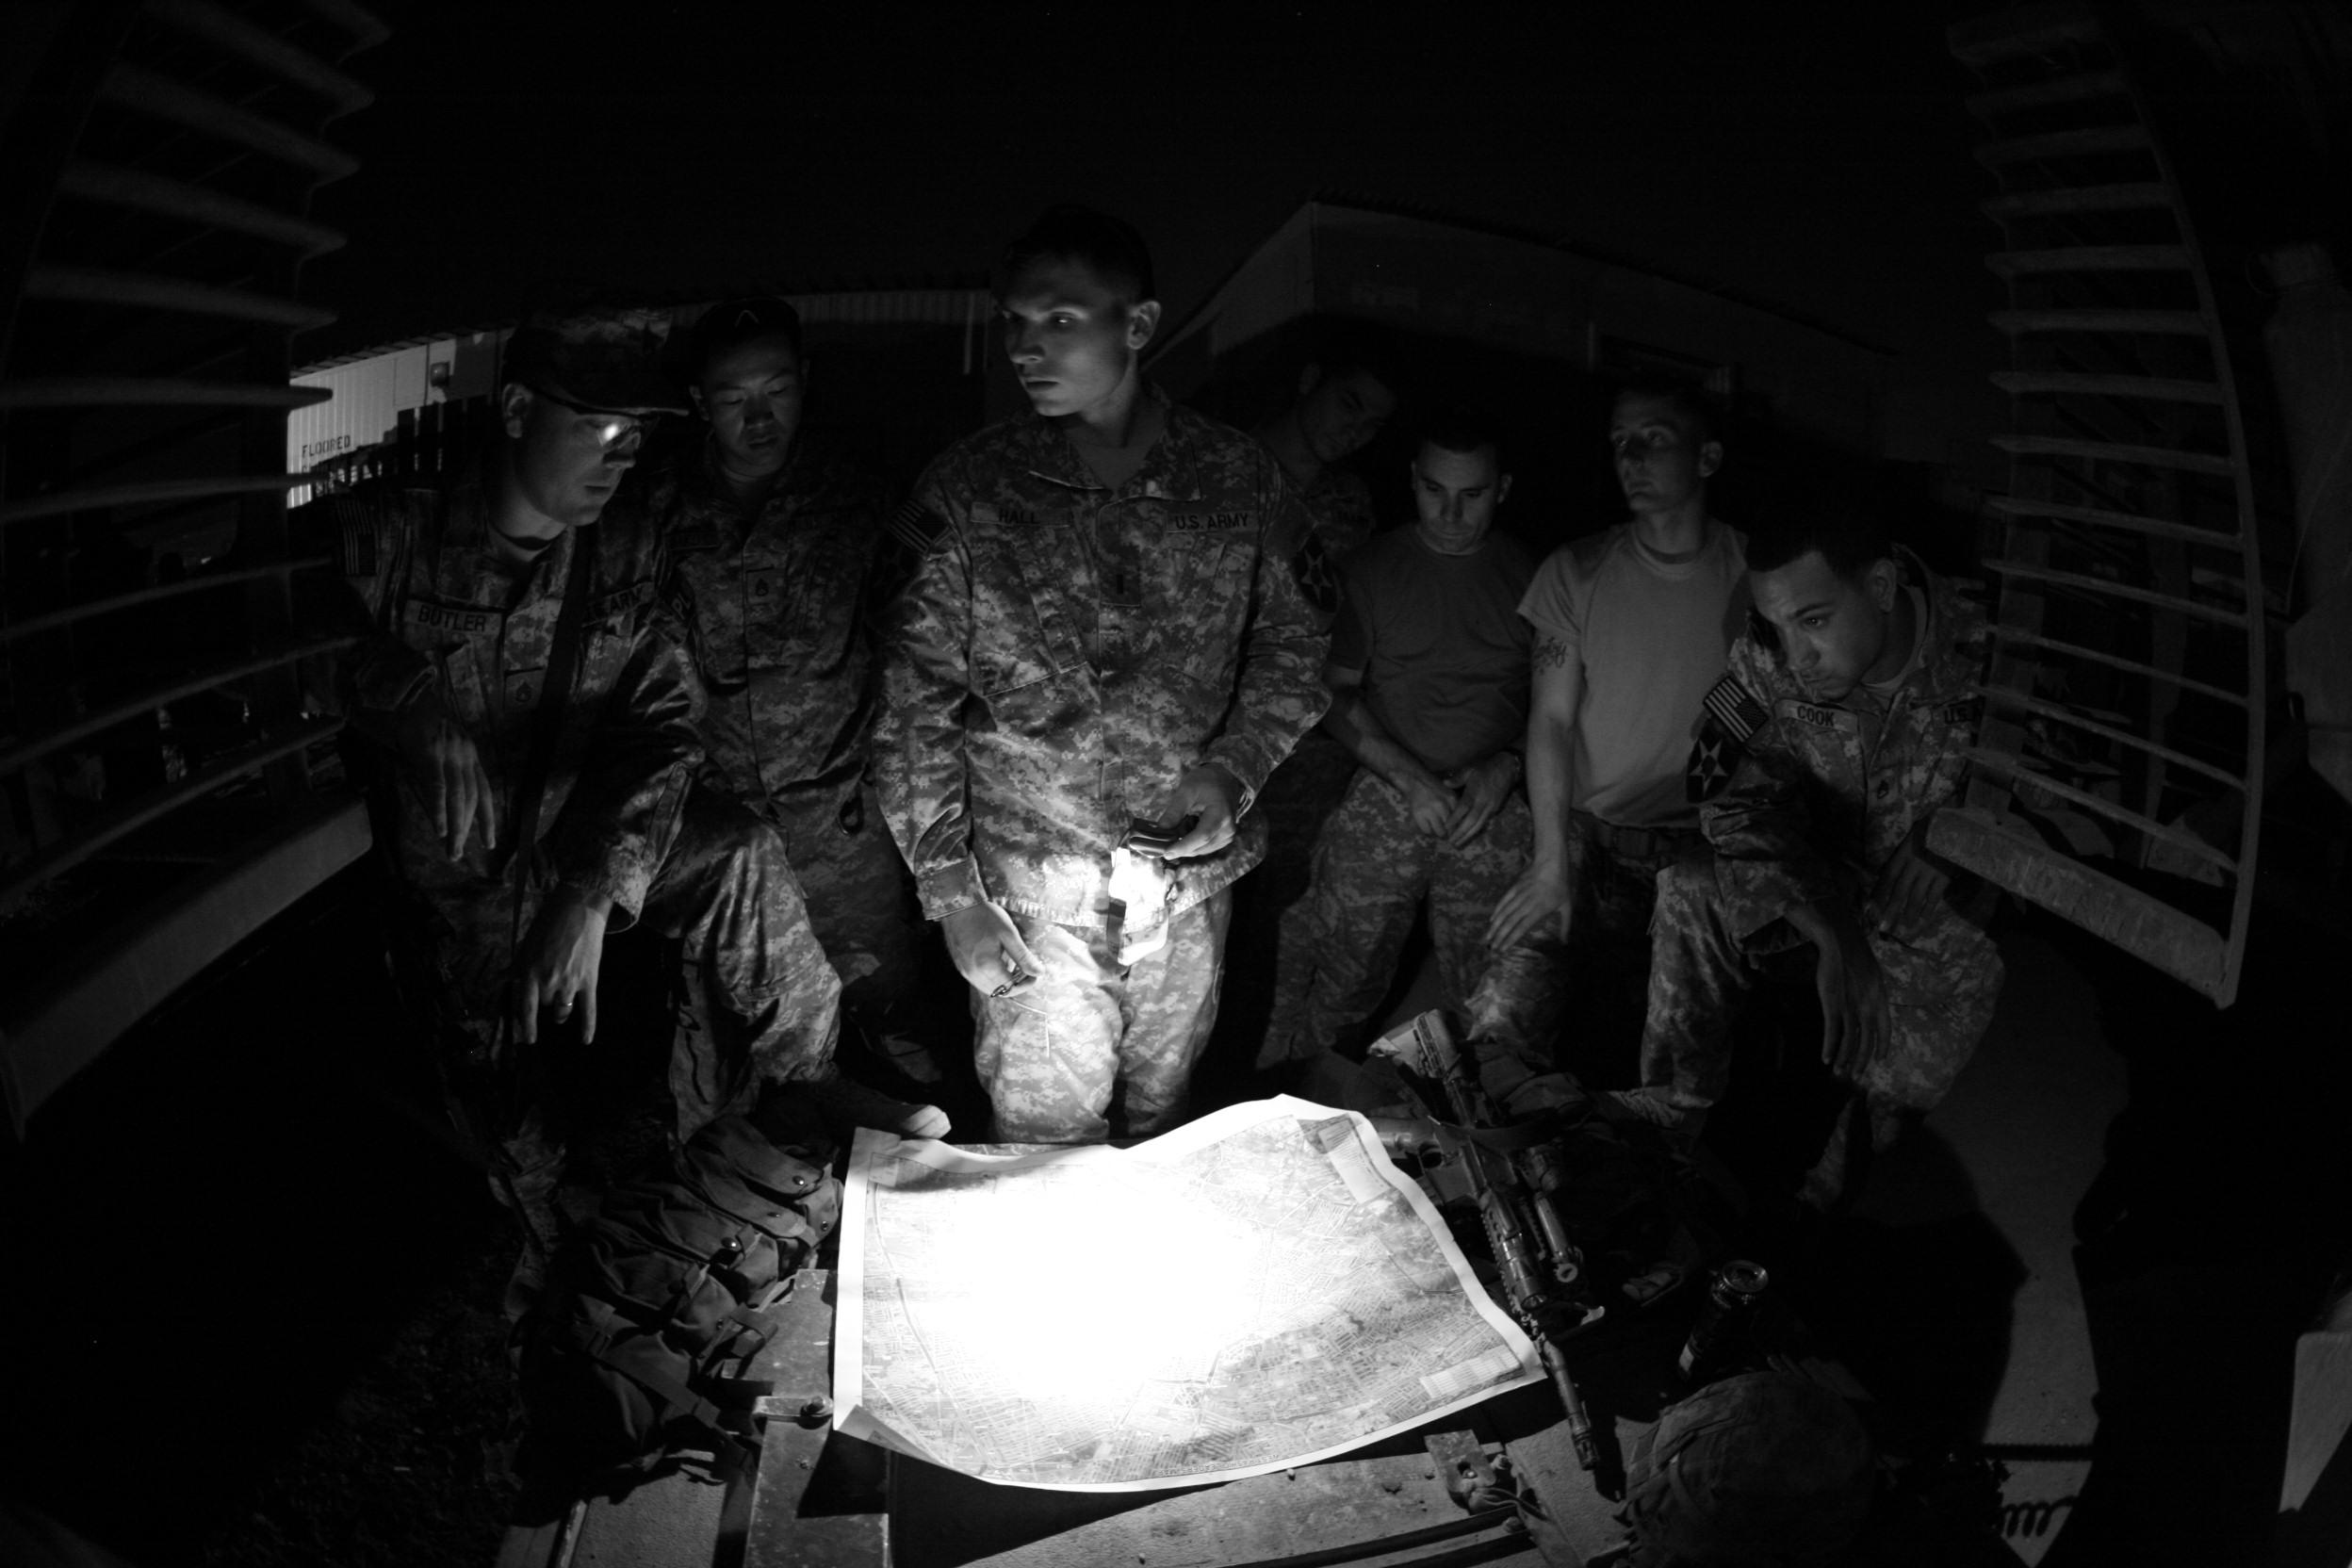 2012-11-26-BaghdadBriefingScoutandSniperTeamLeadersintheGreenZonePriortoaRaid2.jpg